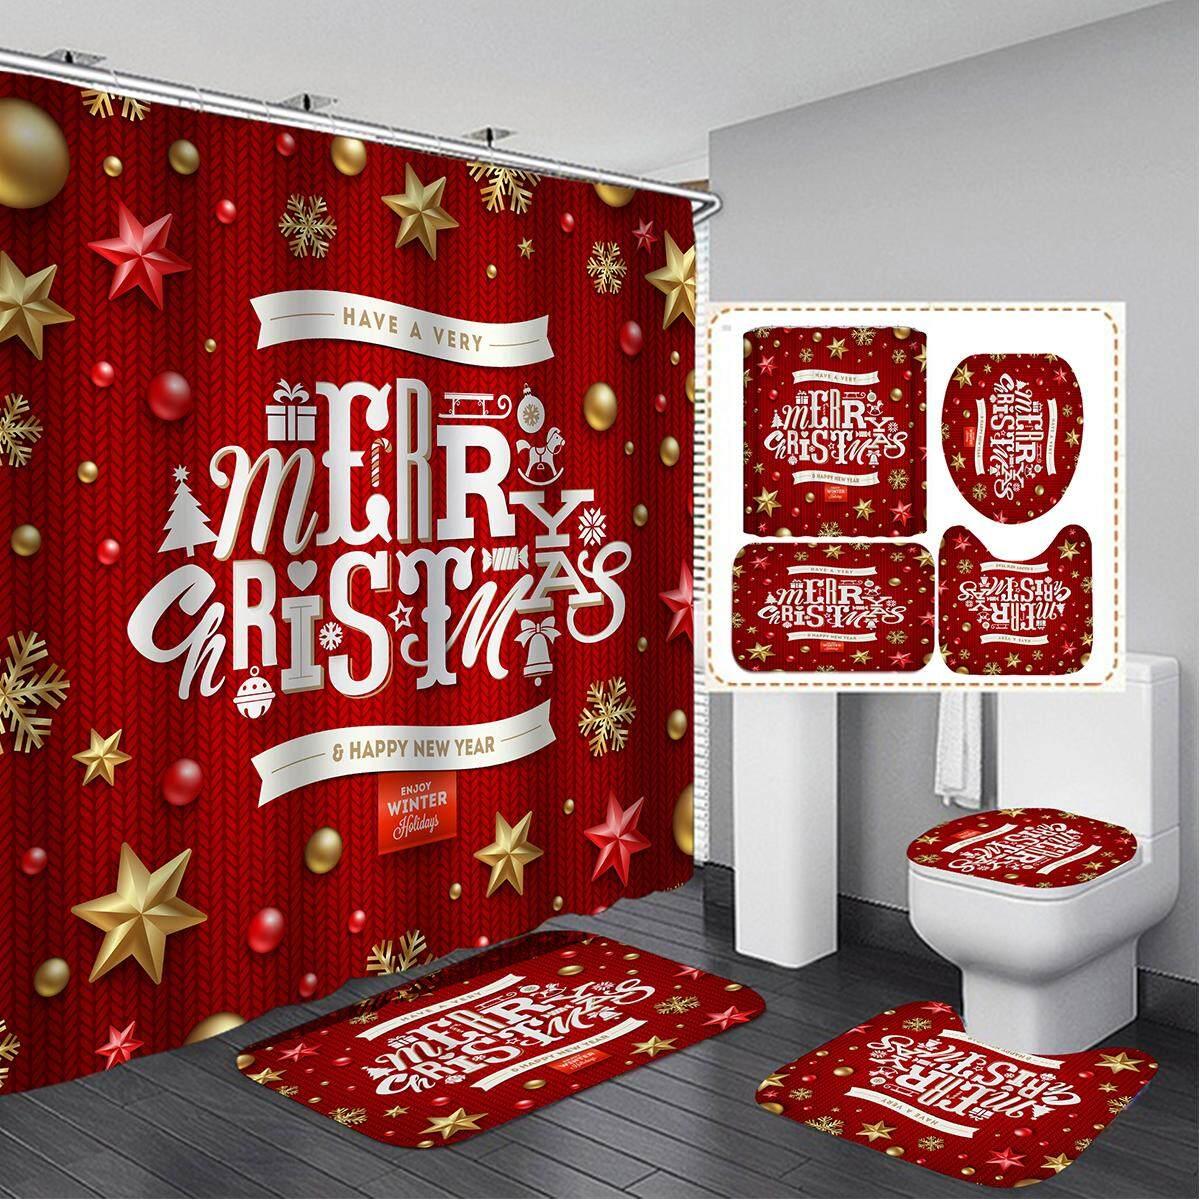 3pcs Non Slip Mat 1pcs Shower Curtain Merry Christmas 180x180cm Bathroom Shower Curtain Non Slip Mat Set